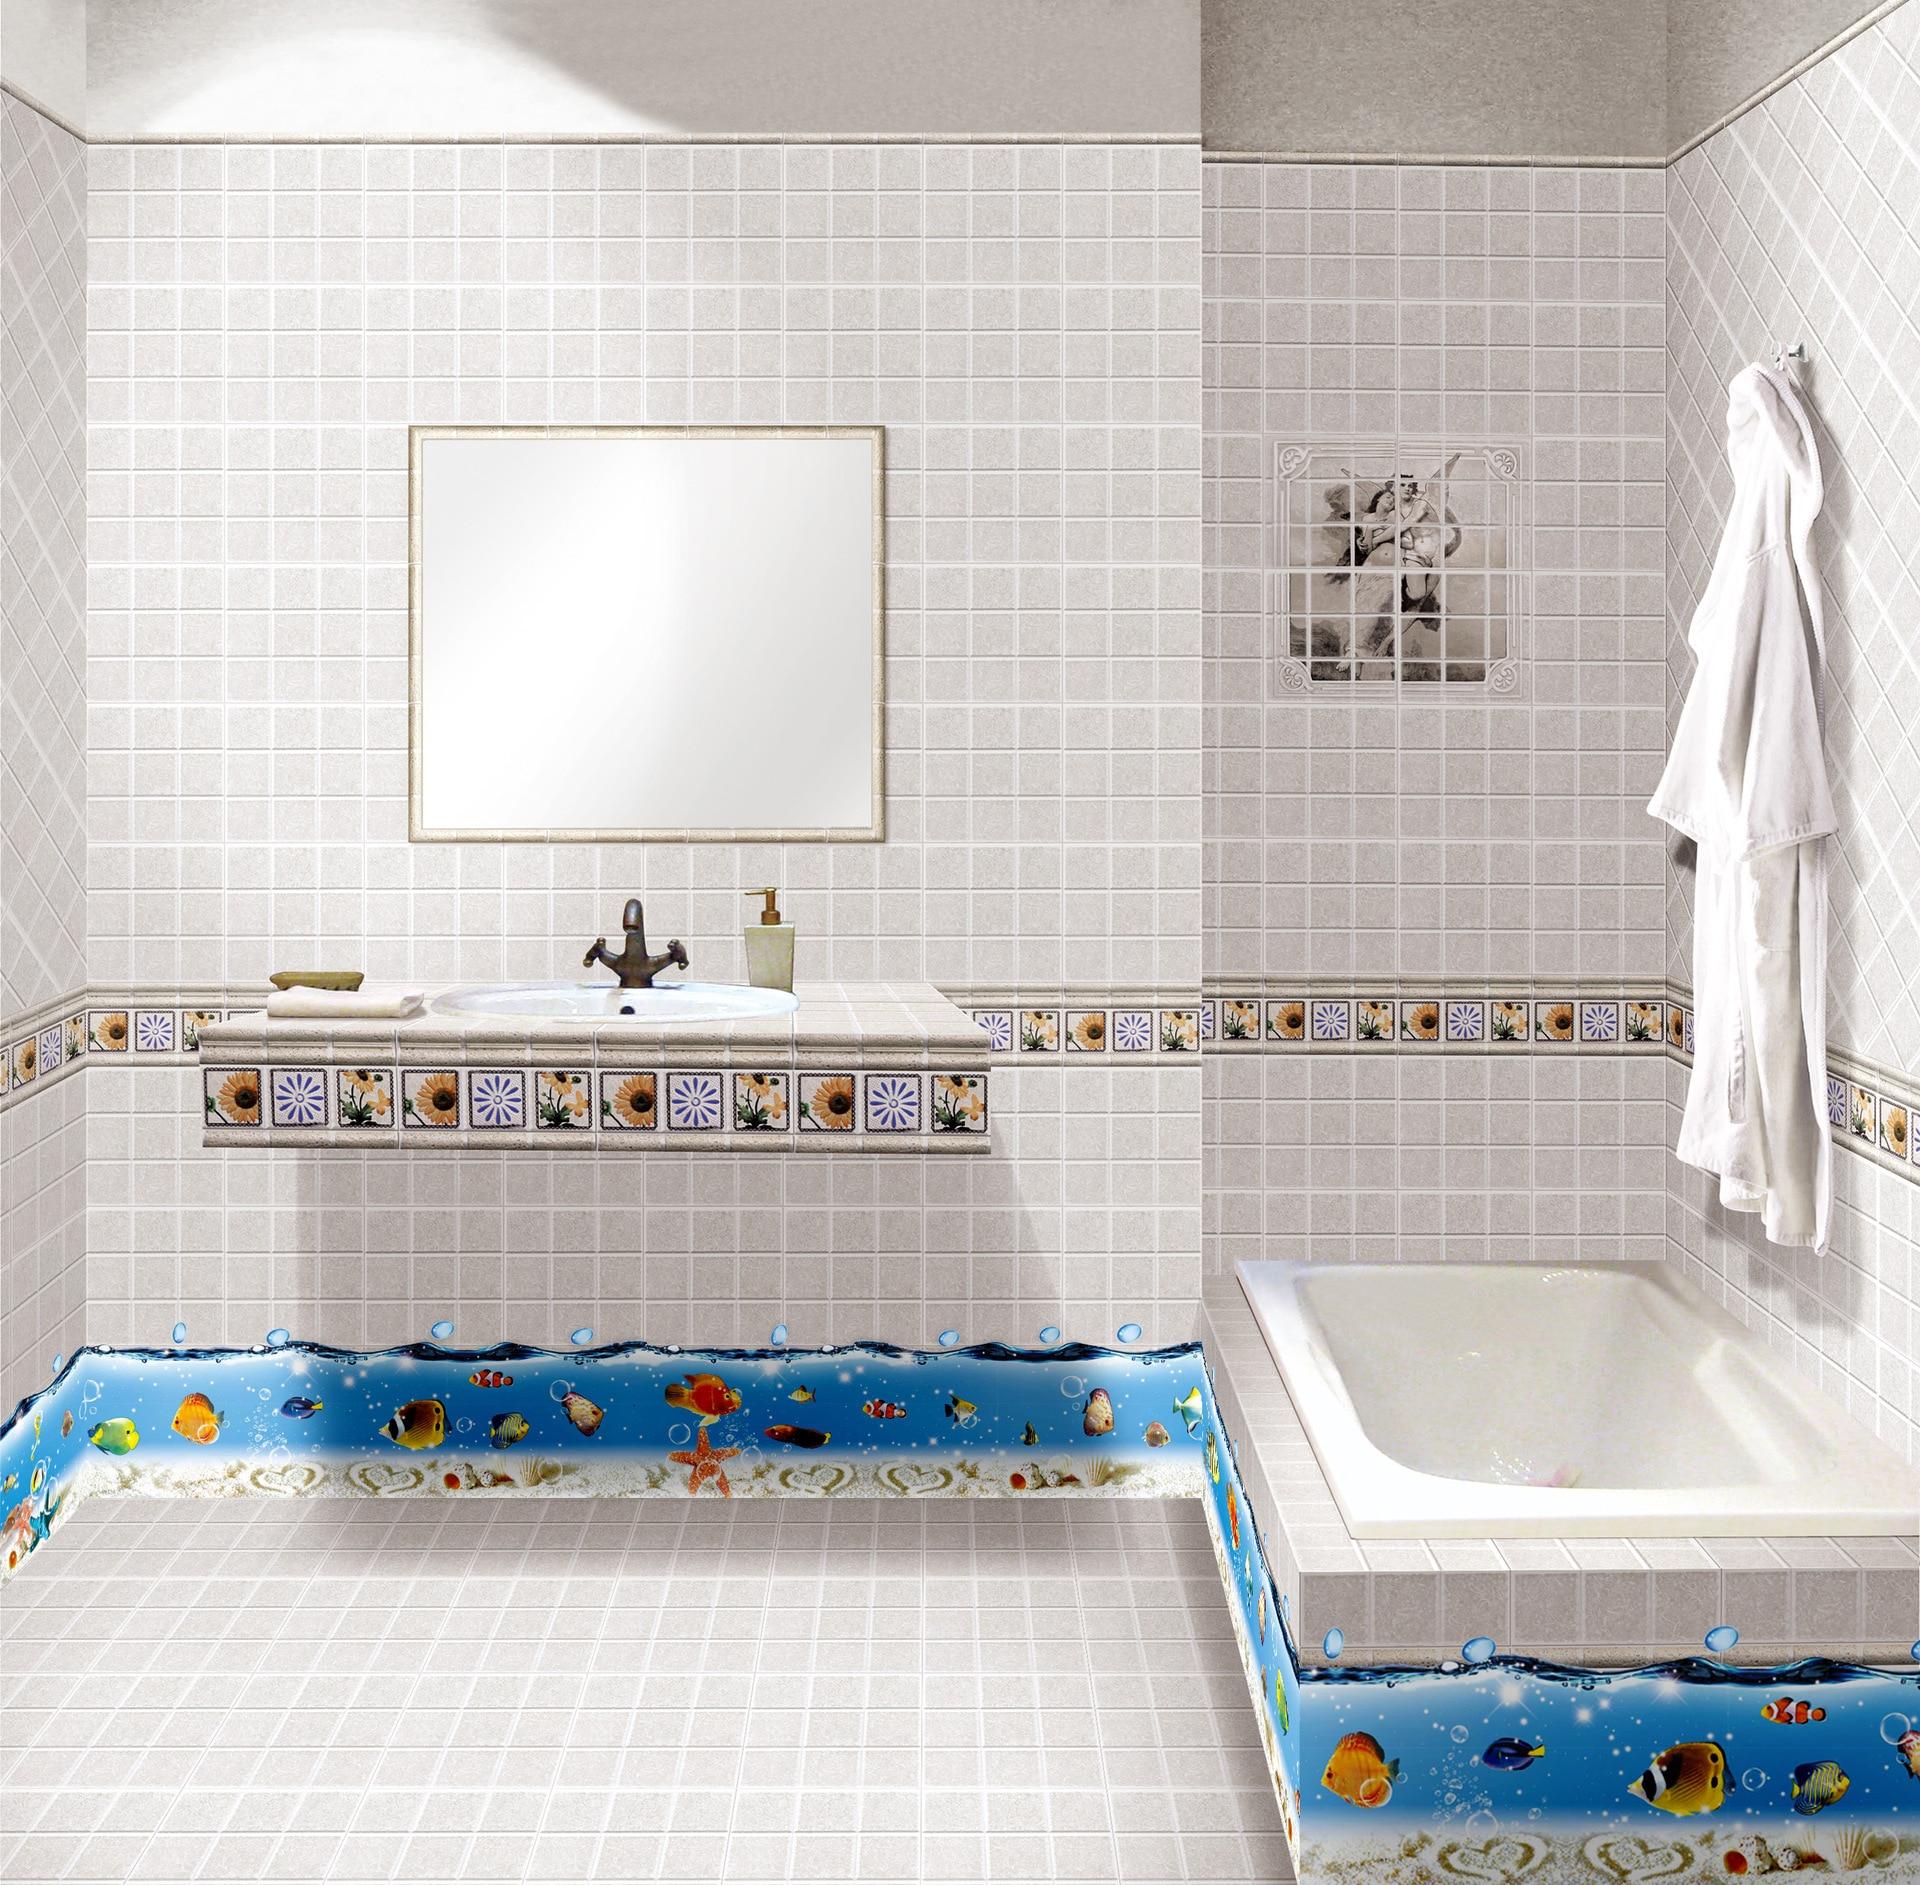 Tropical Fish Bathroom Decor - Home Decorating Ideas